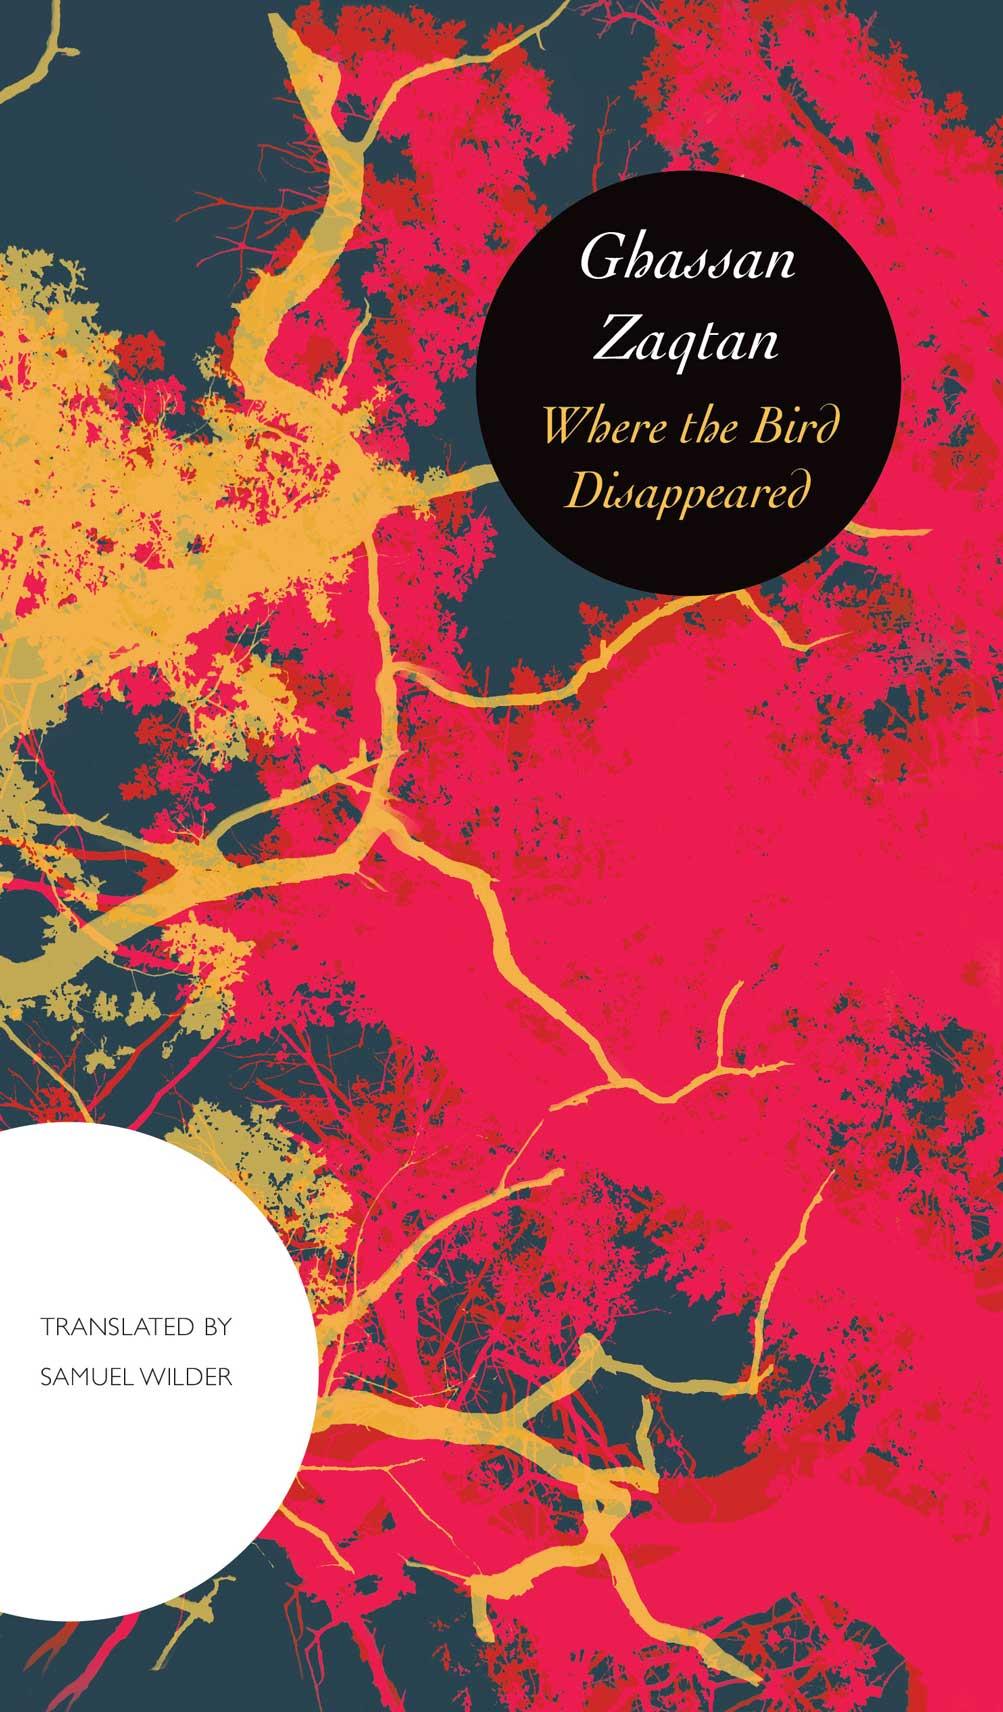 Where the Bird Disappeared by Ghassan Zaqtan | Seagull Books